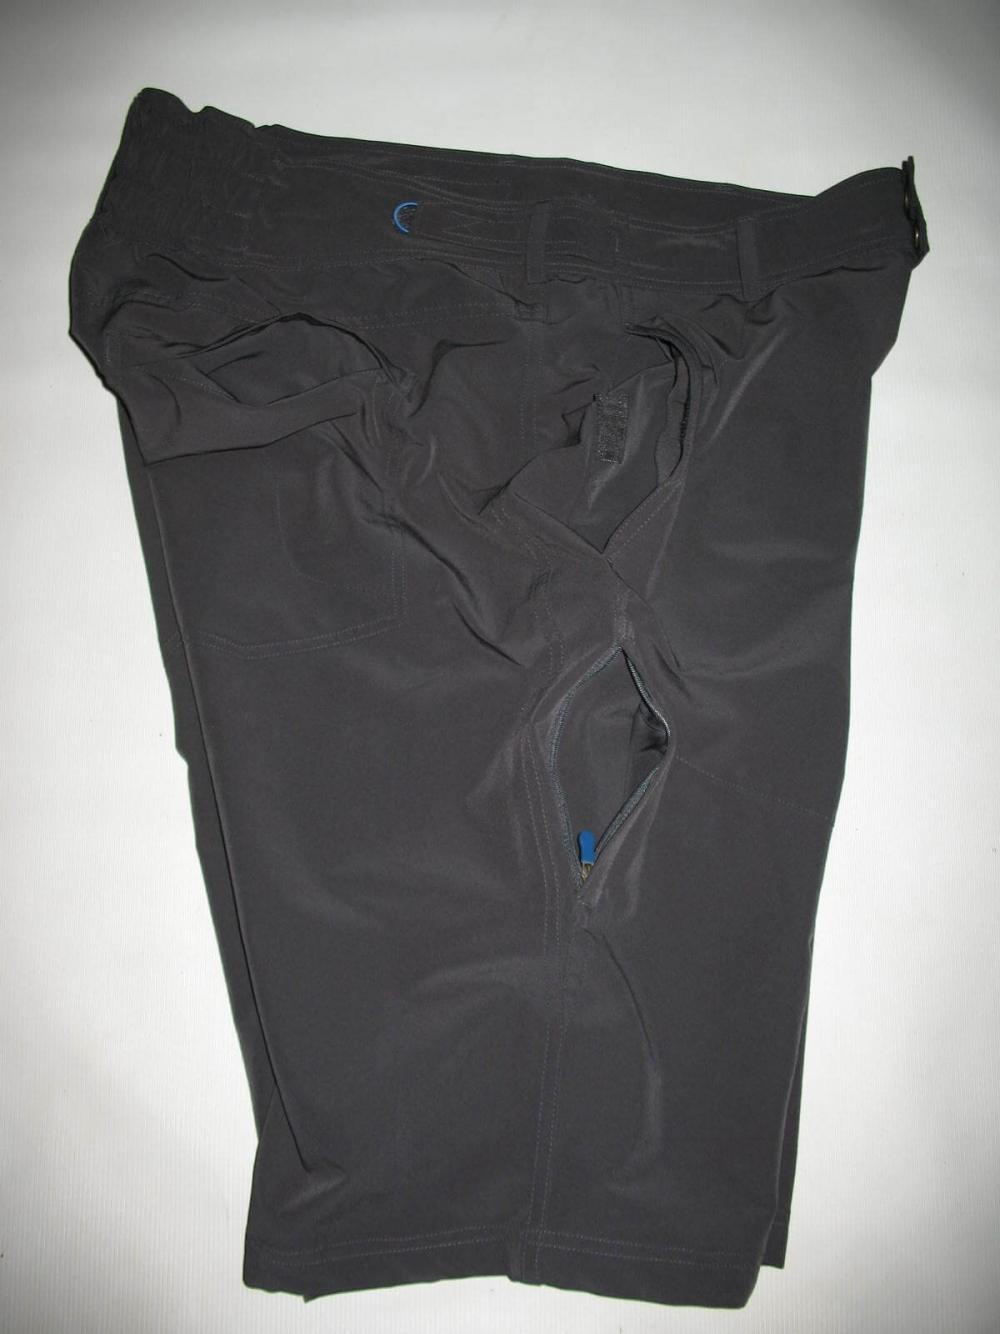 Шорты URBAN ACTIVE bike shorts (размер M/L) - 3